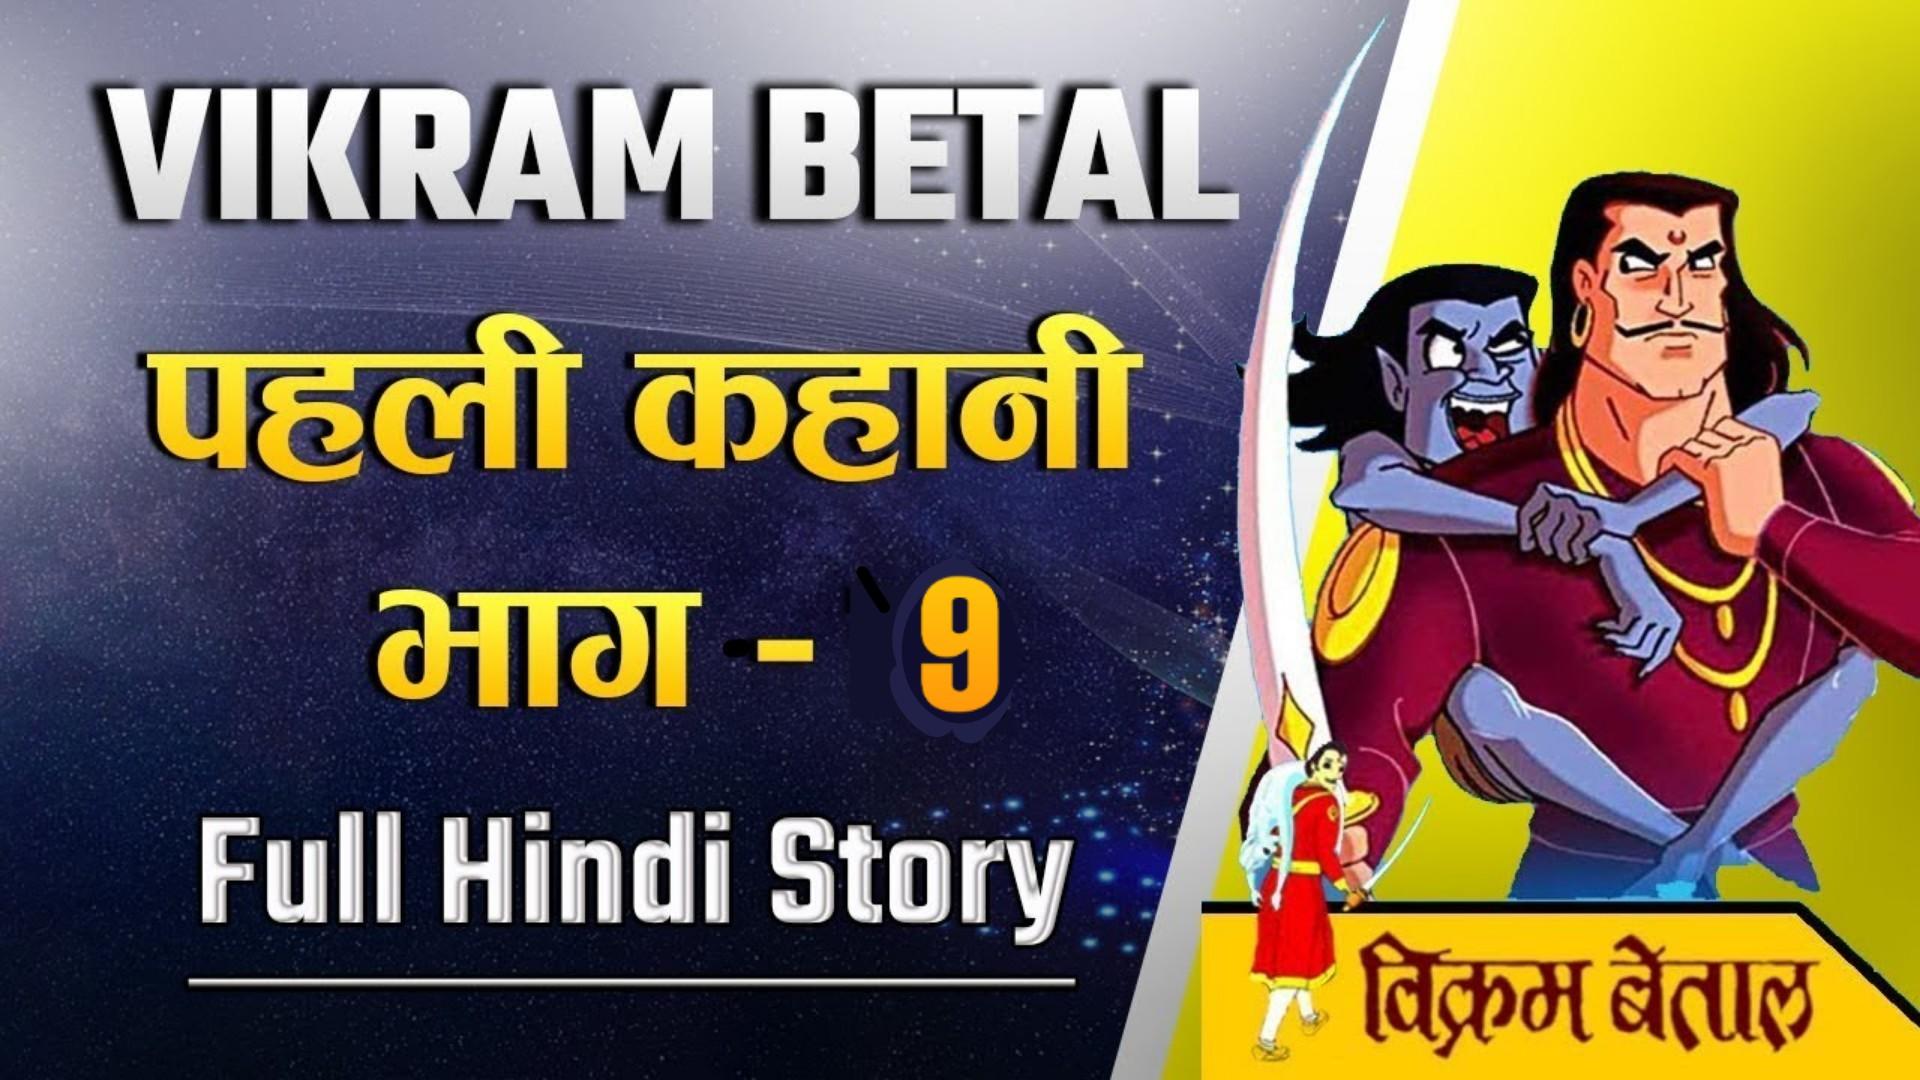 Vikram Vetal Hindi Story part 9